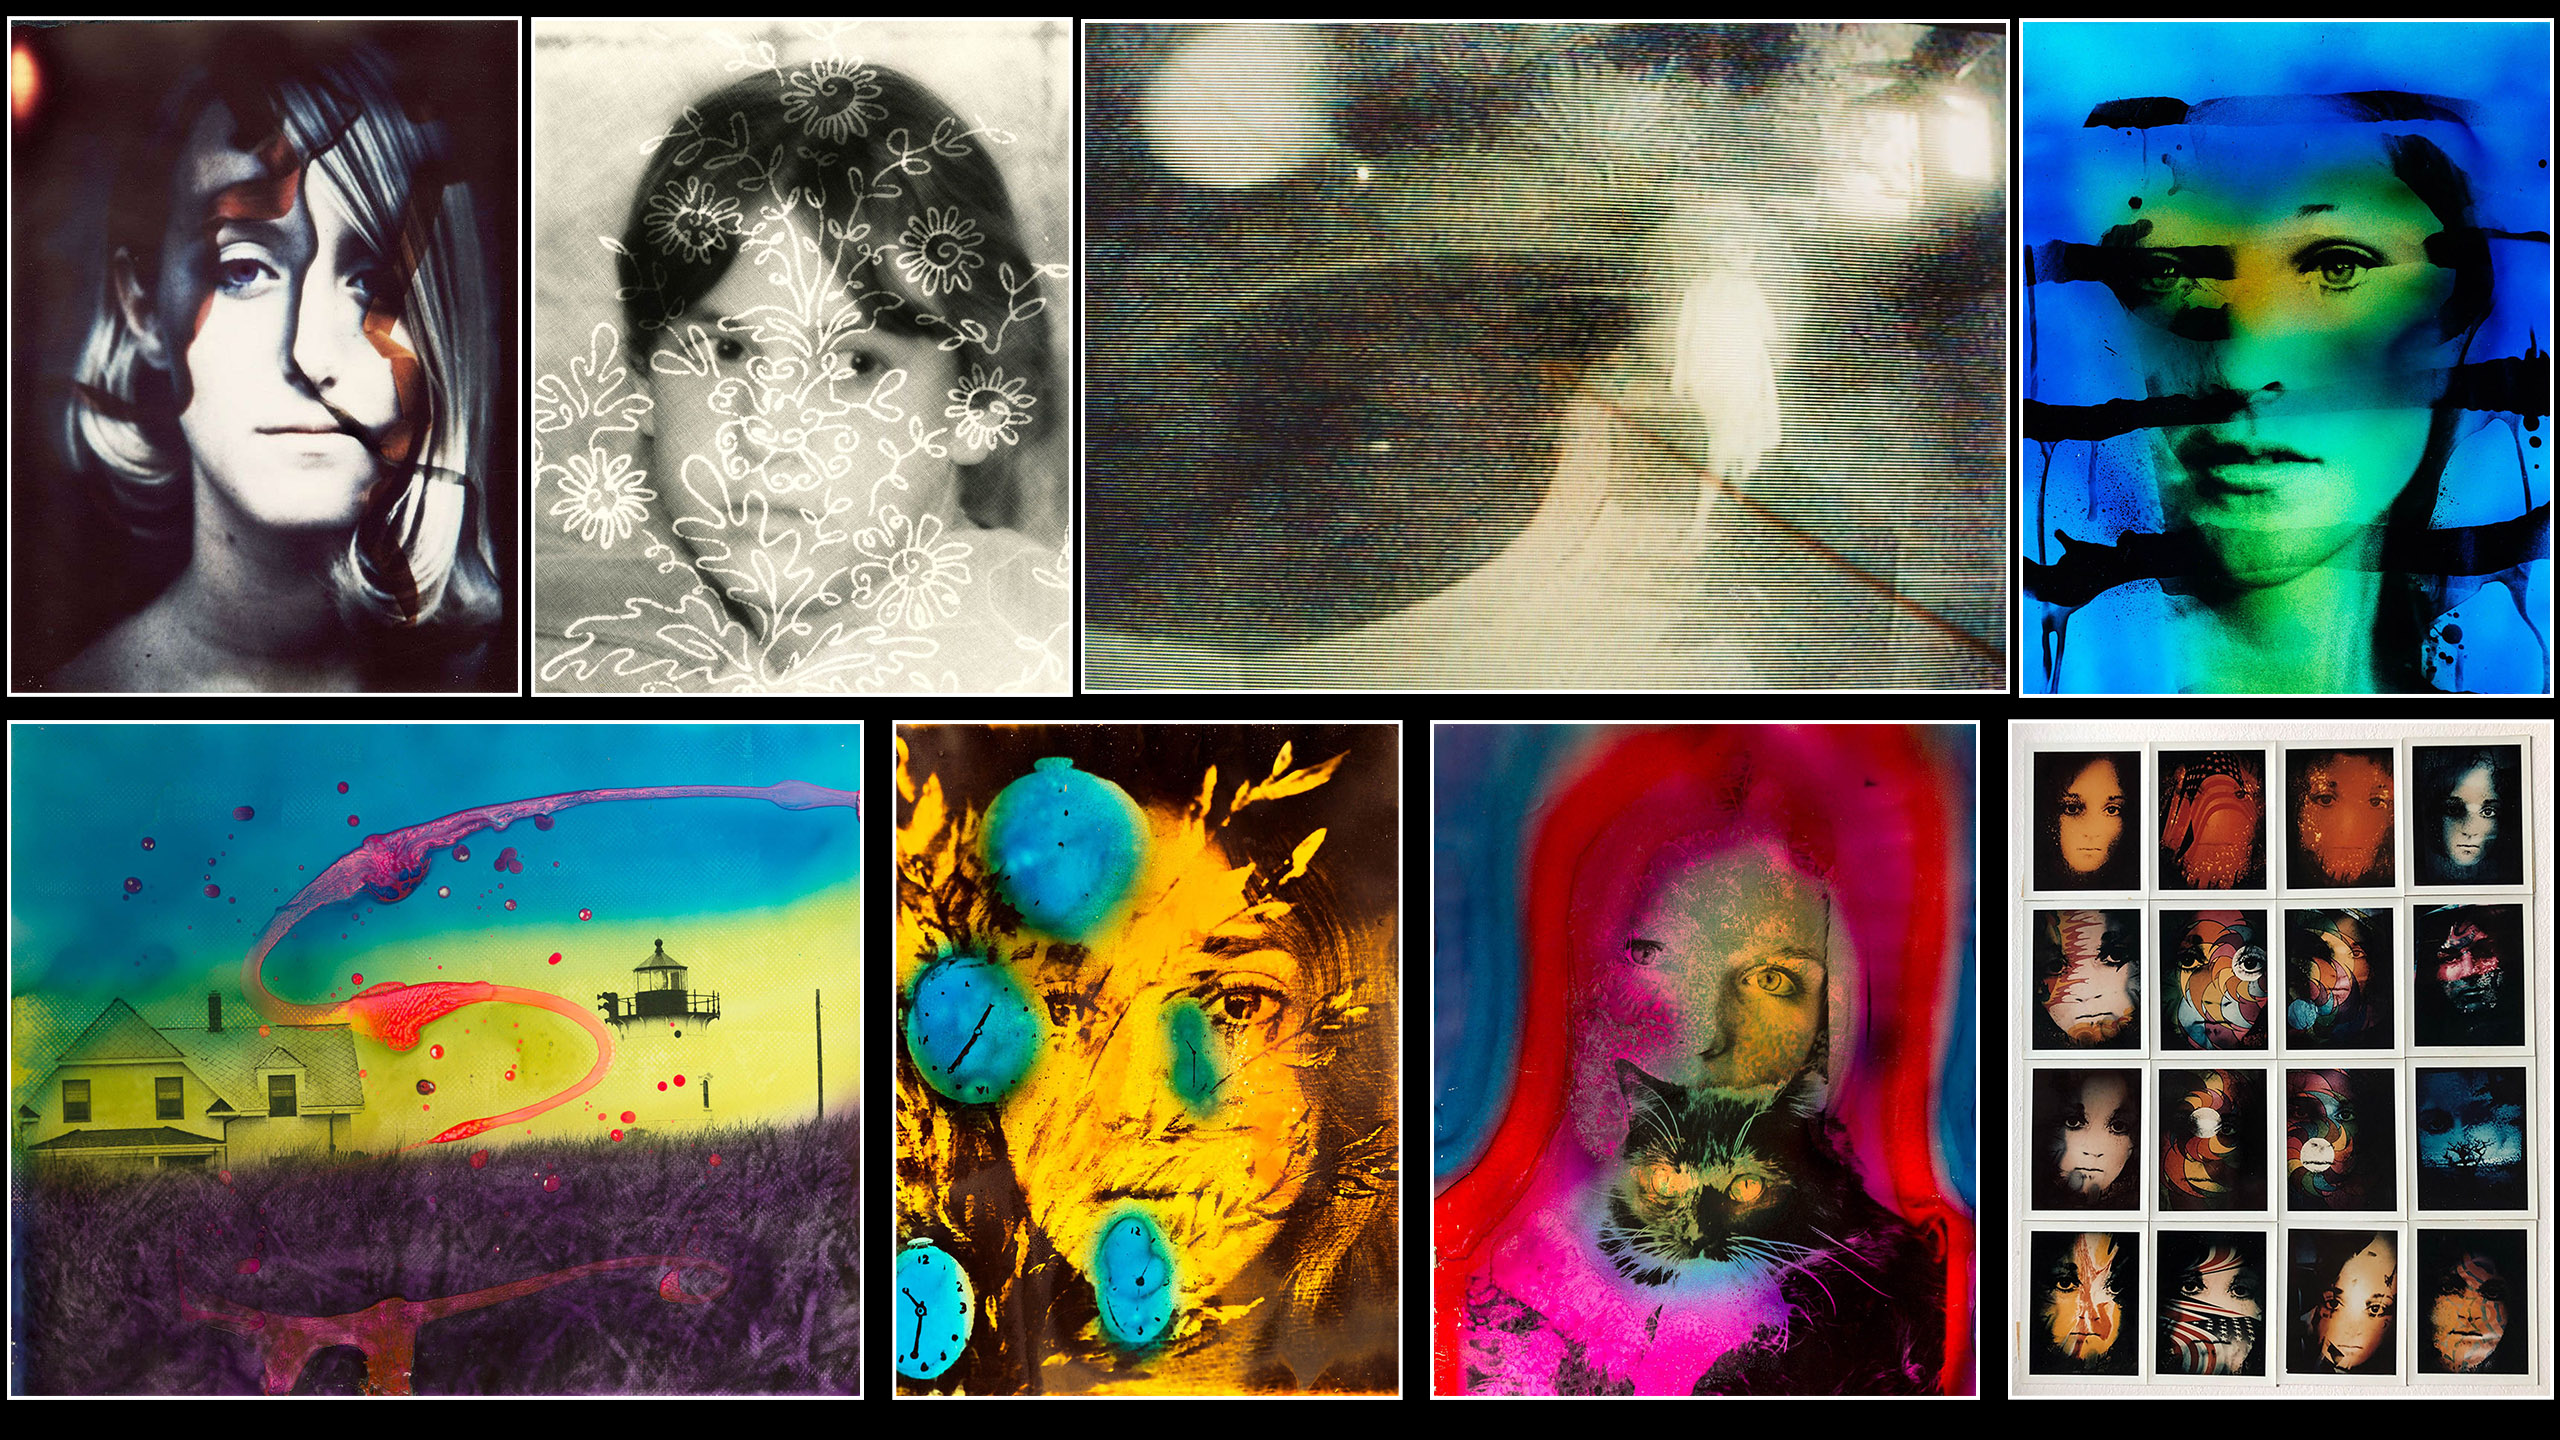 On Photography: Kali Archibald, 1932-2019